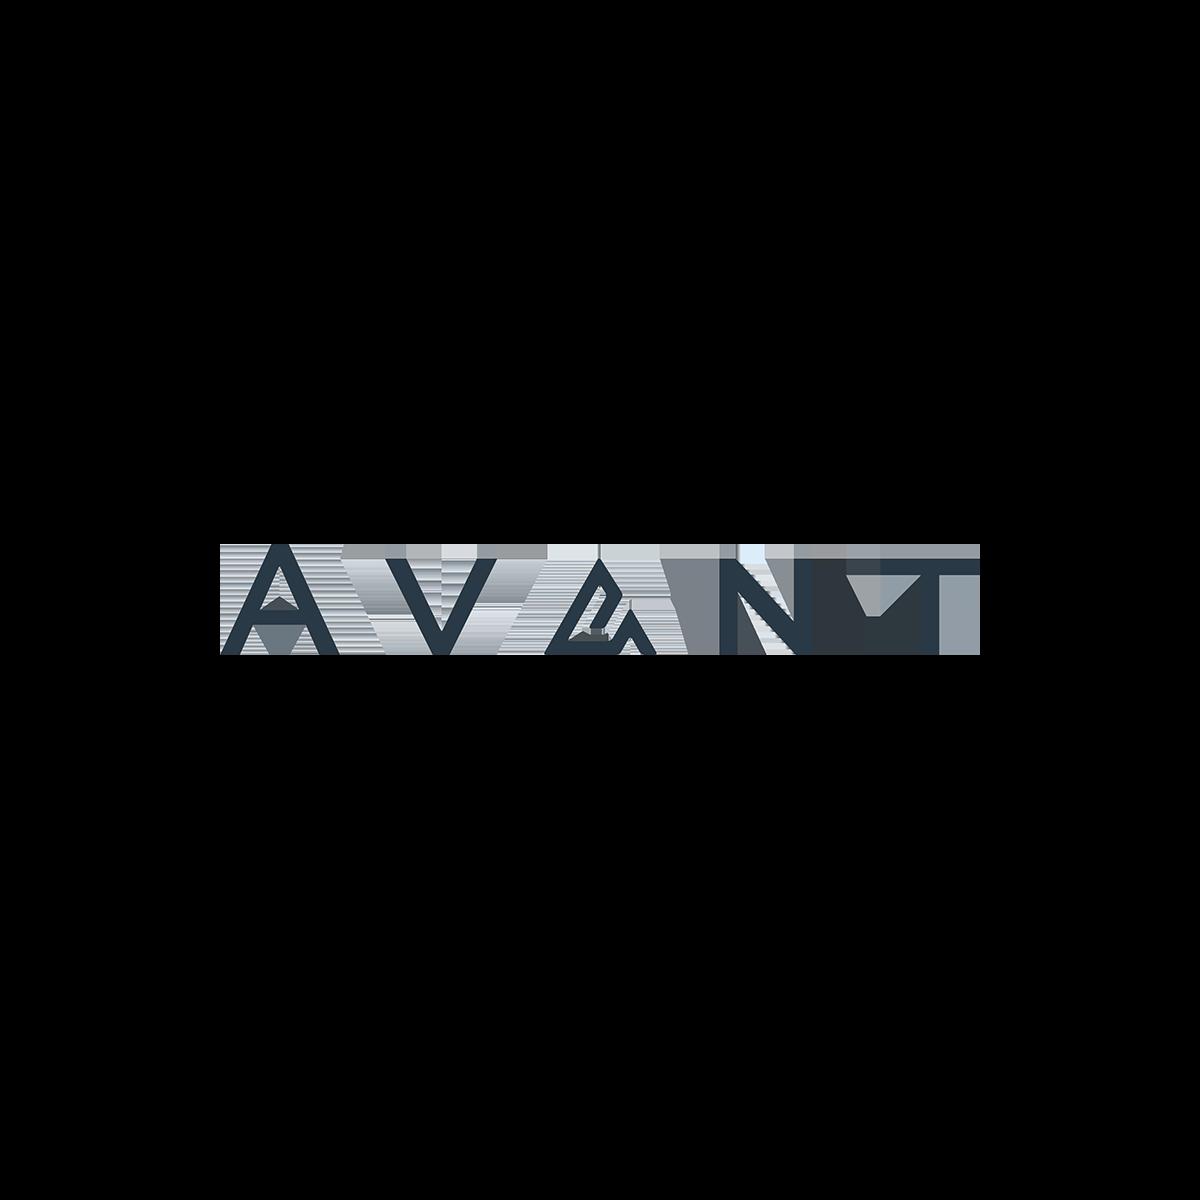 avant promo code